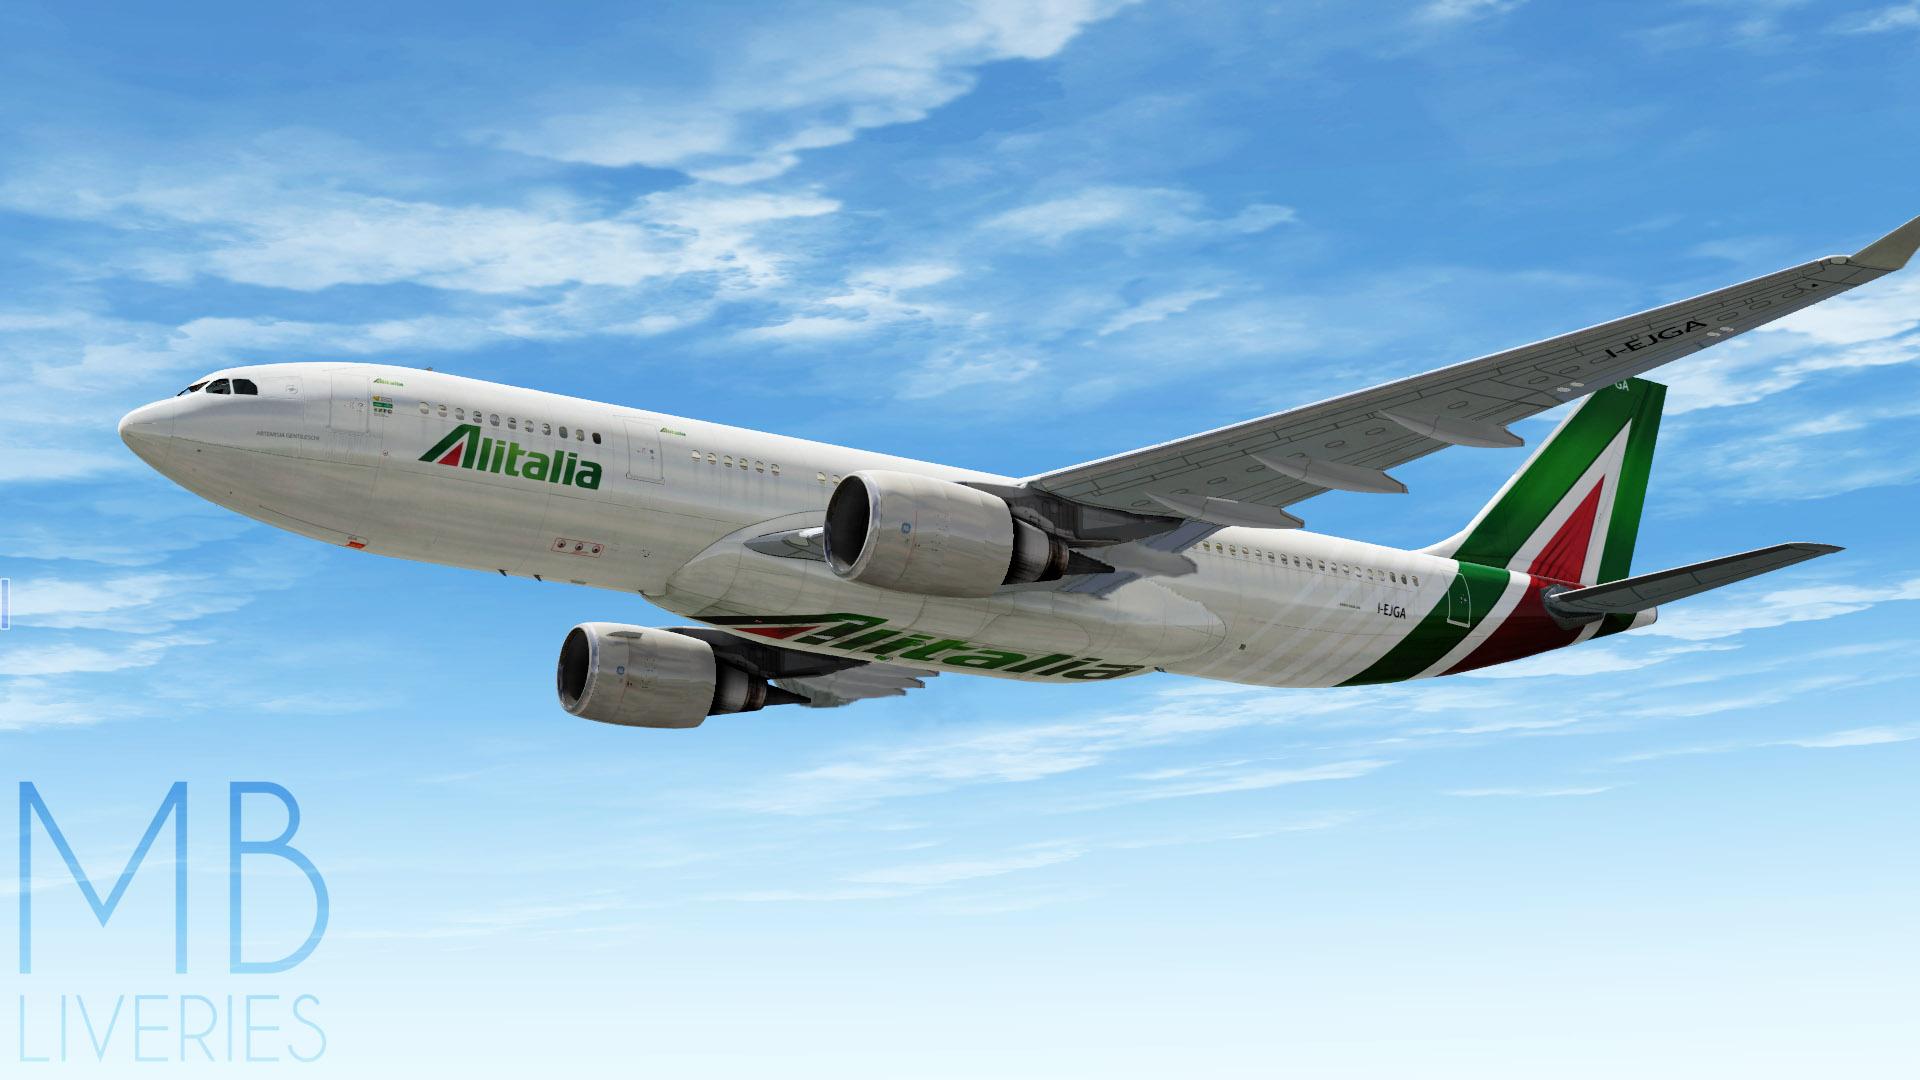 Alitalia (New) - Airbus A330-200 JarDesign - Aircraft Skins